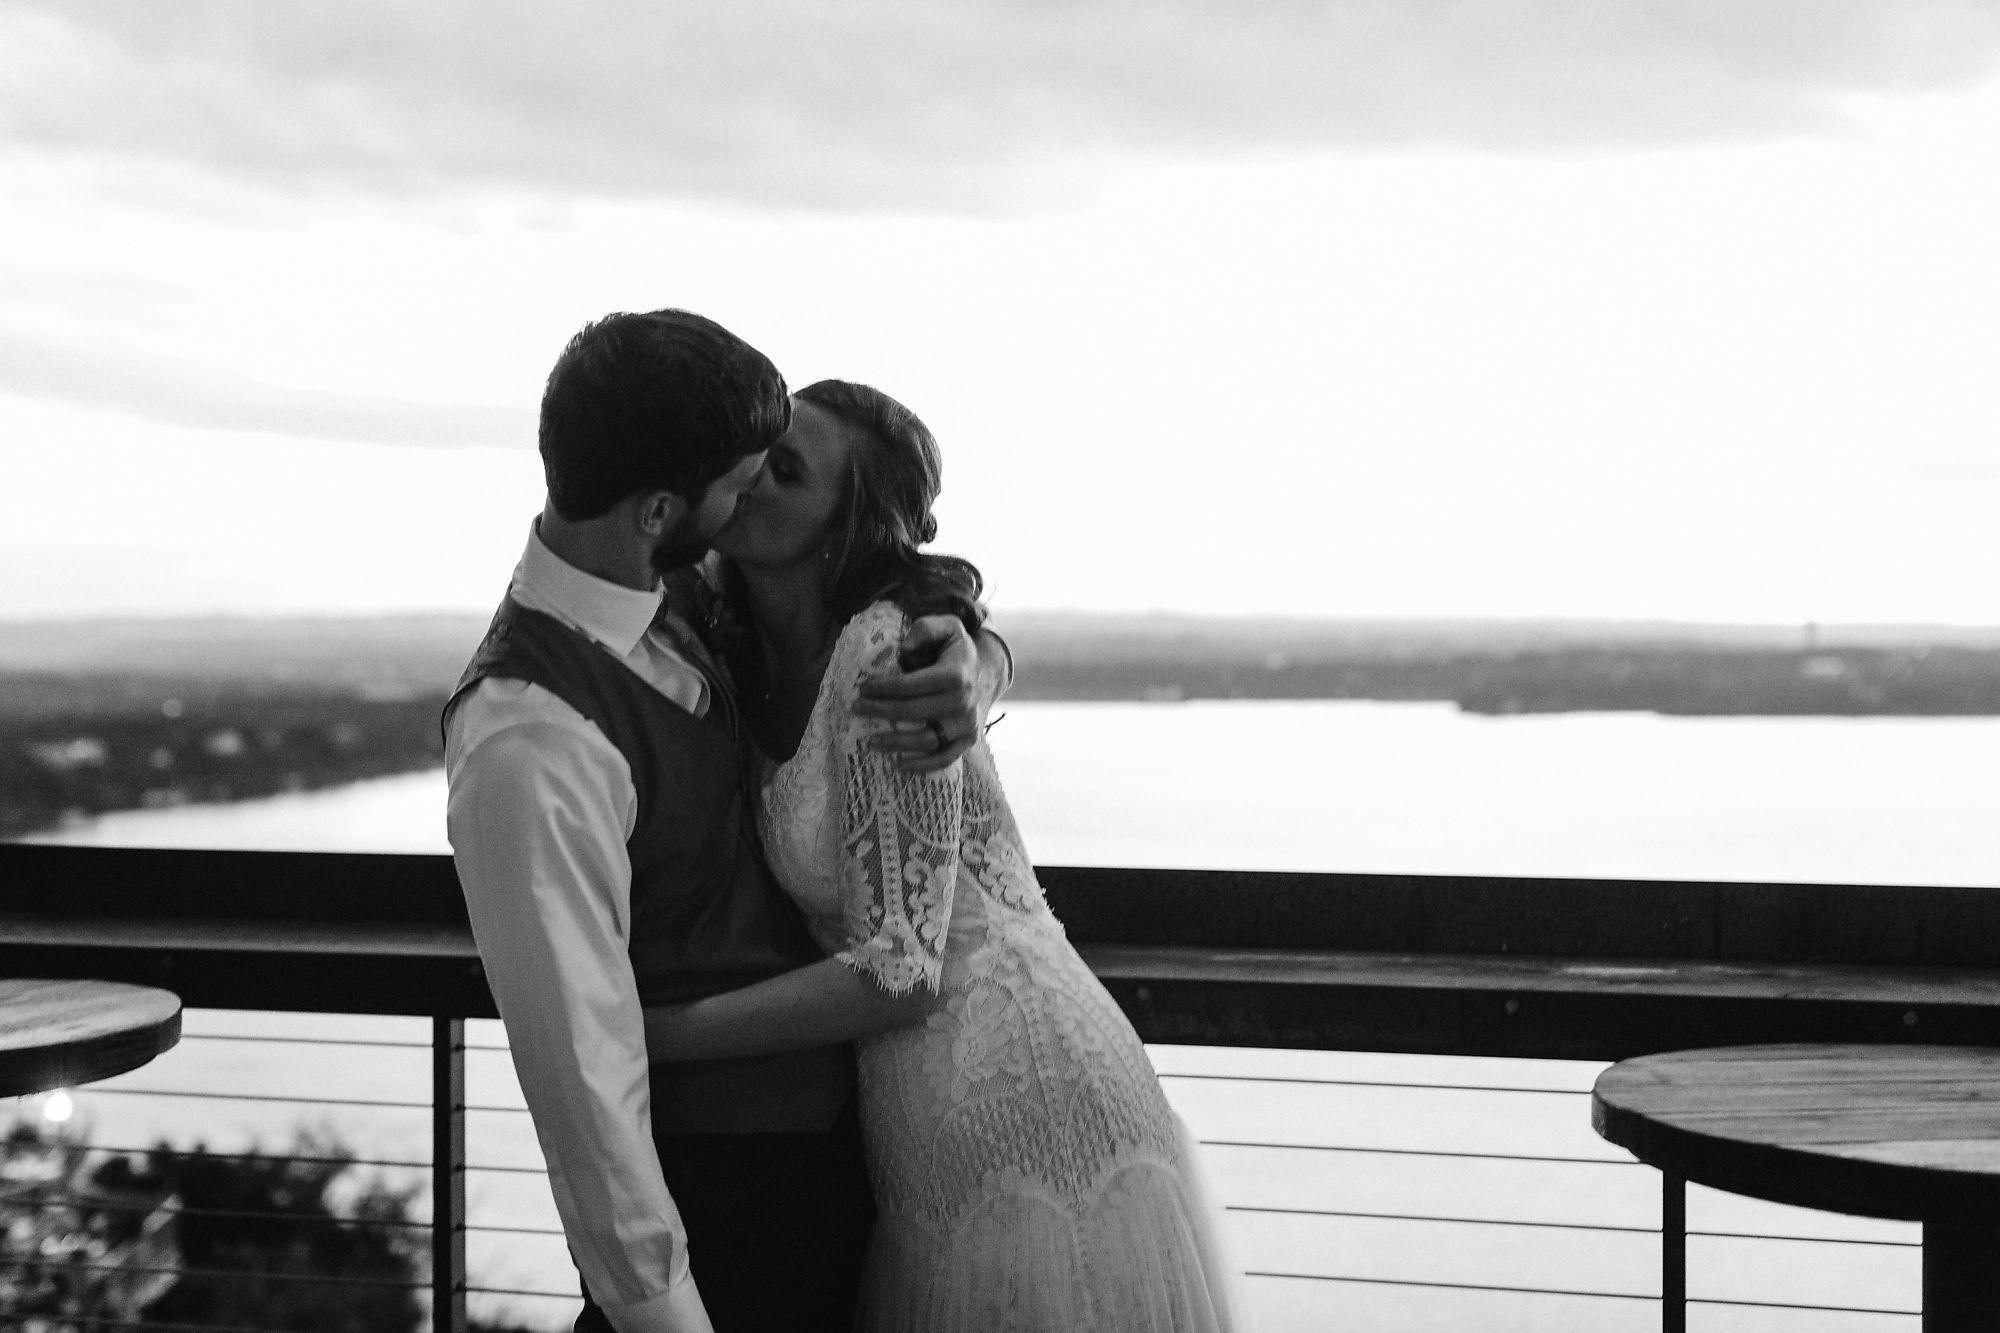 jessica_austin_oasis_brewery_wedding_photos185336.jpg